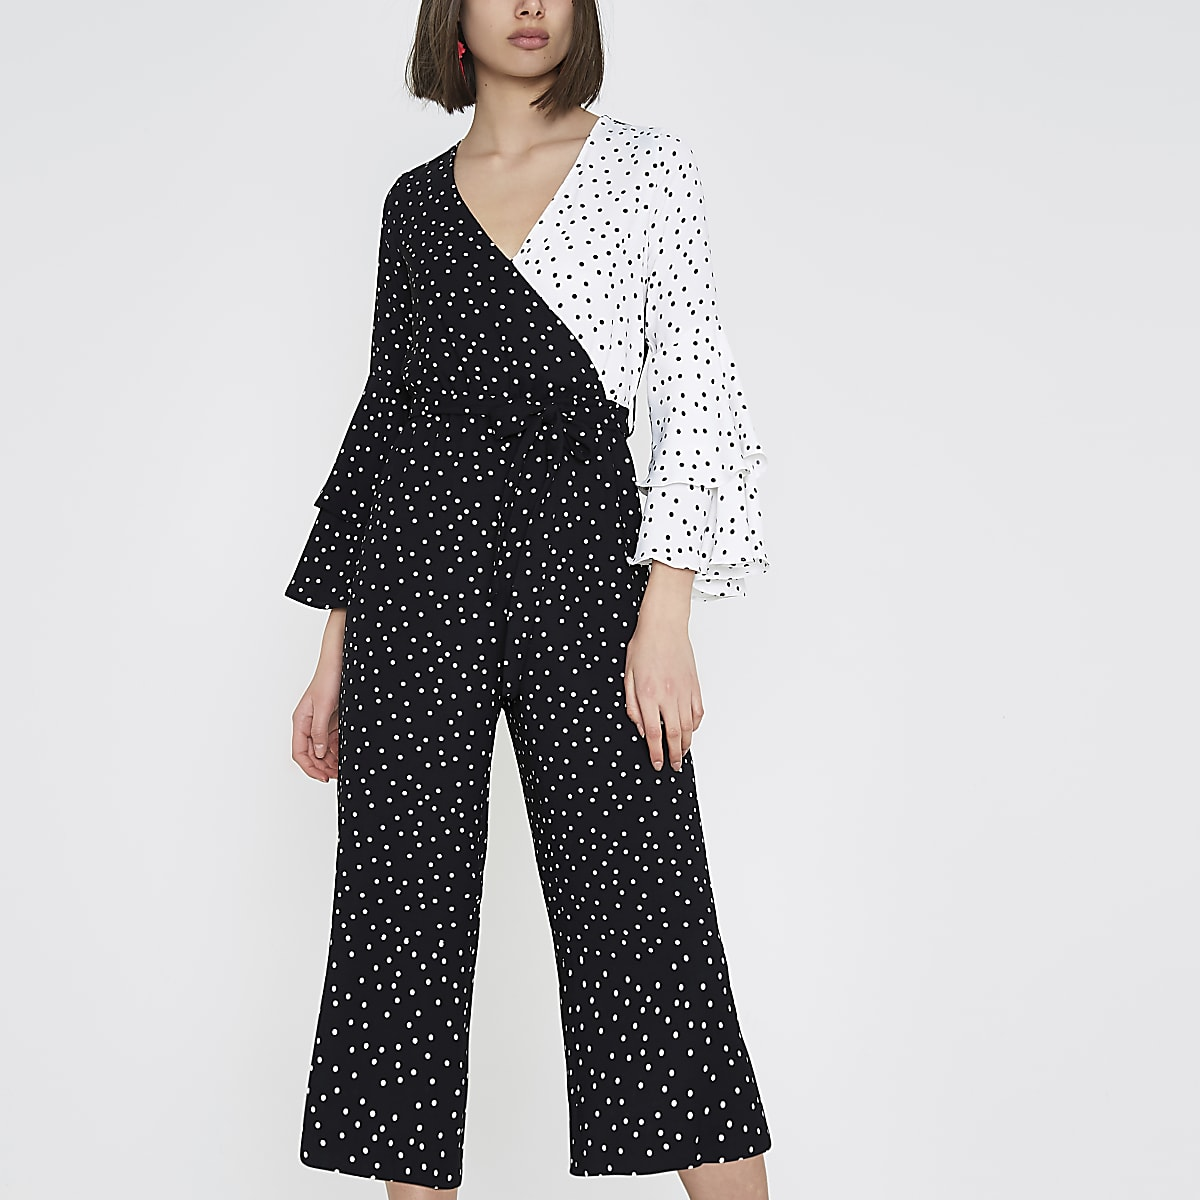 16229a3ab9 Black block polka dot frill culotte jumpsuit - Jumpsuits - Playsuits    Jumpsuits - women